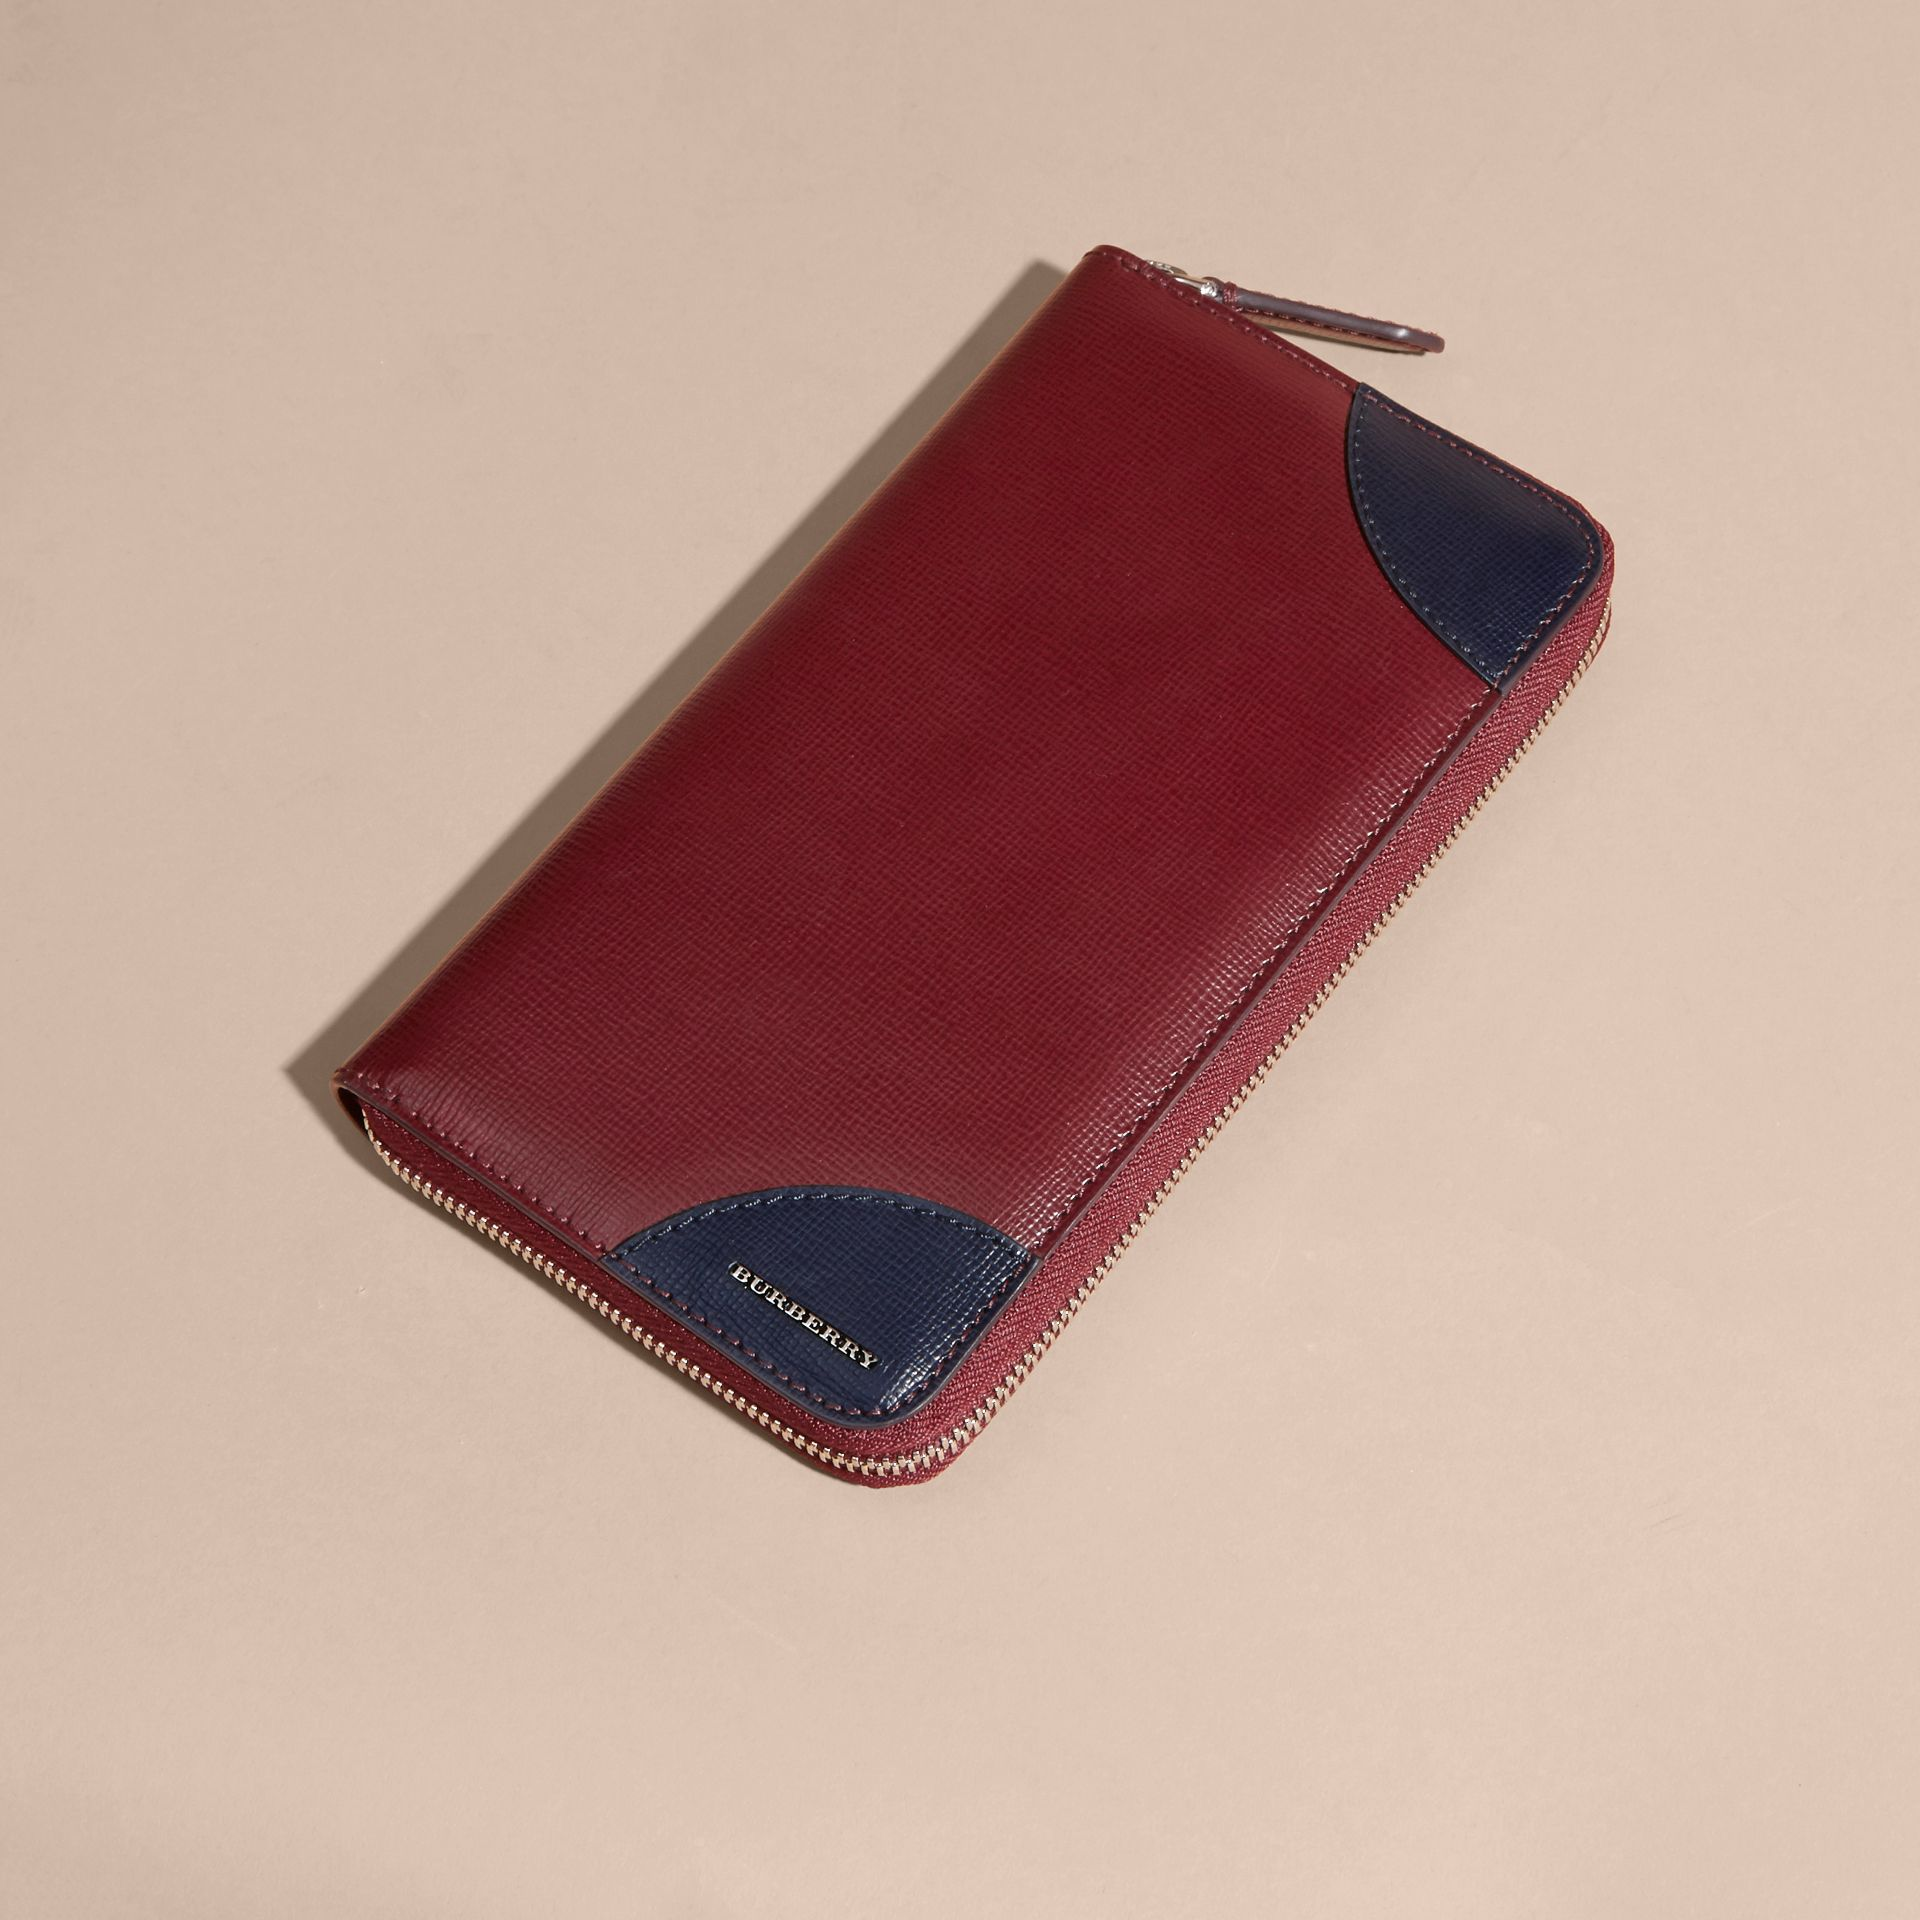 Contrast Corner London Leather Ziparound Wallet Burgundy Red - gallery image 6